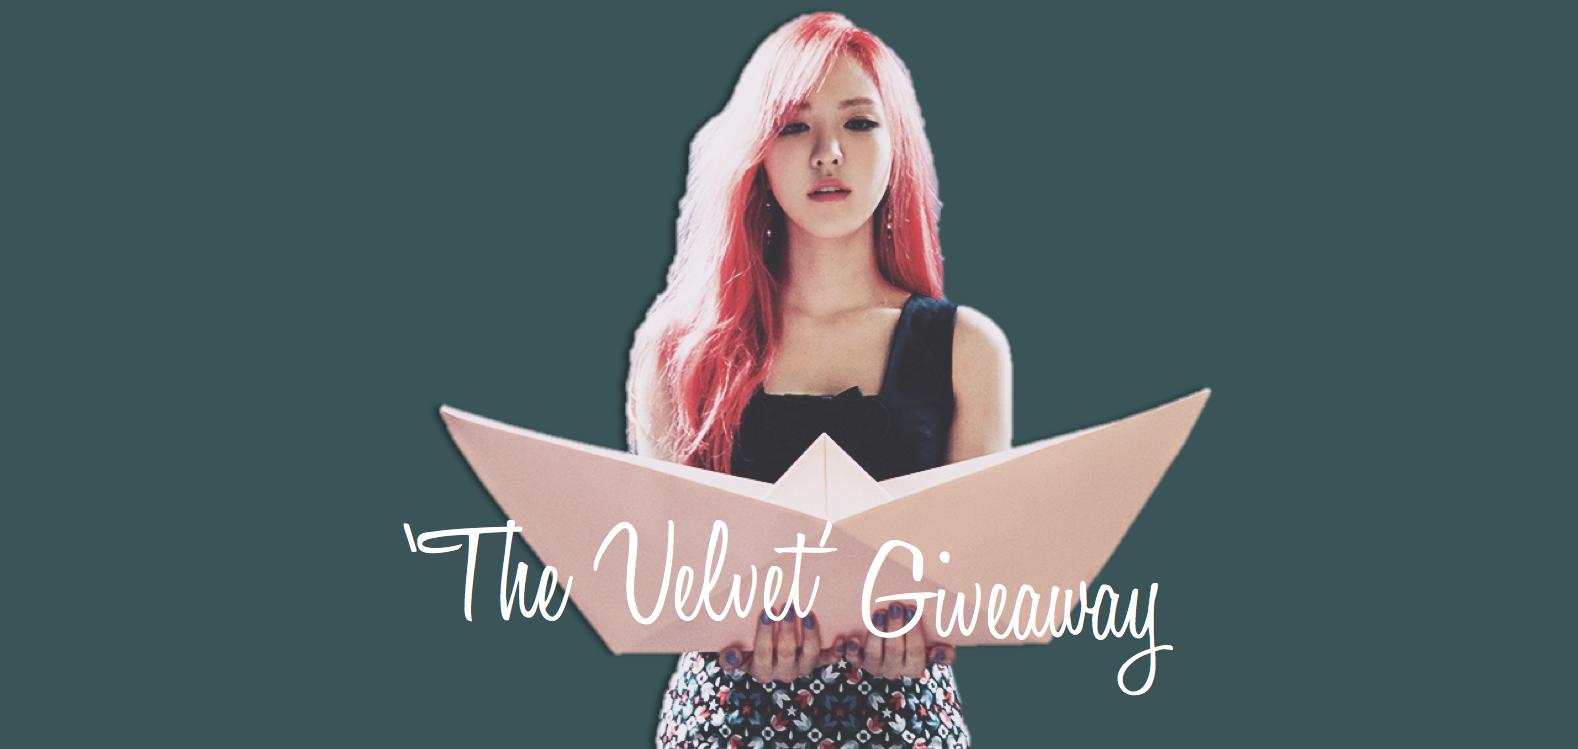 Kpop tumblr giveaways